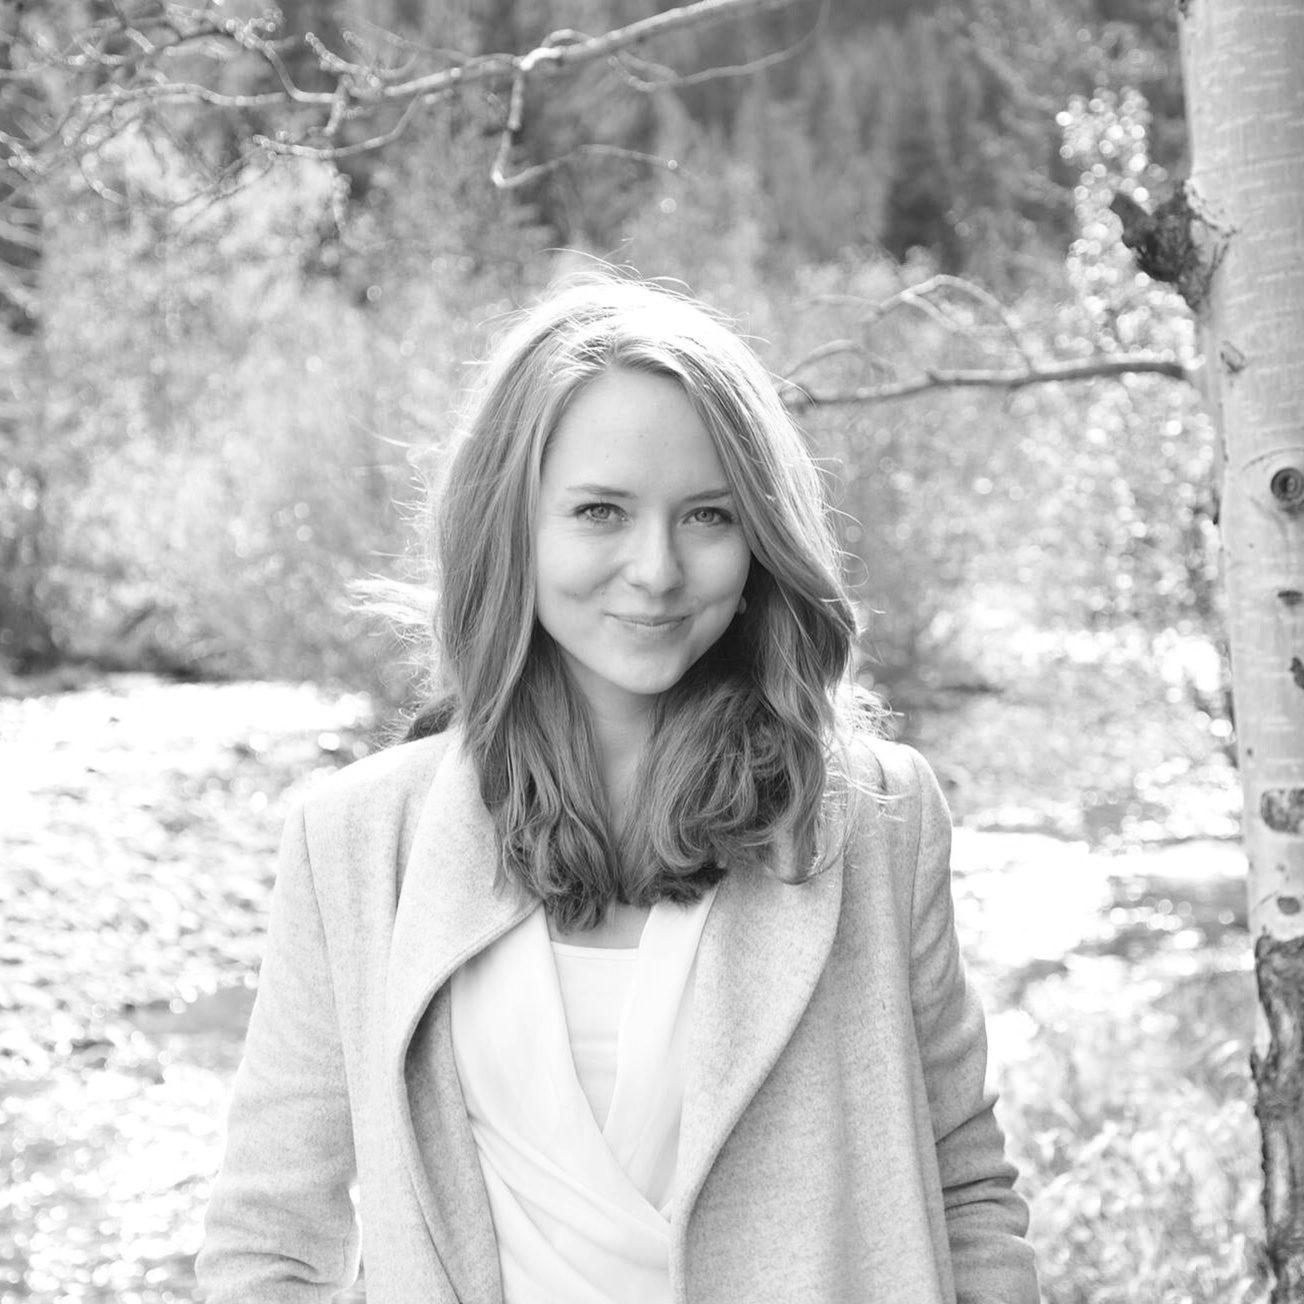 Laura Kihlstrom